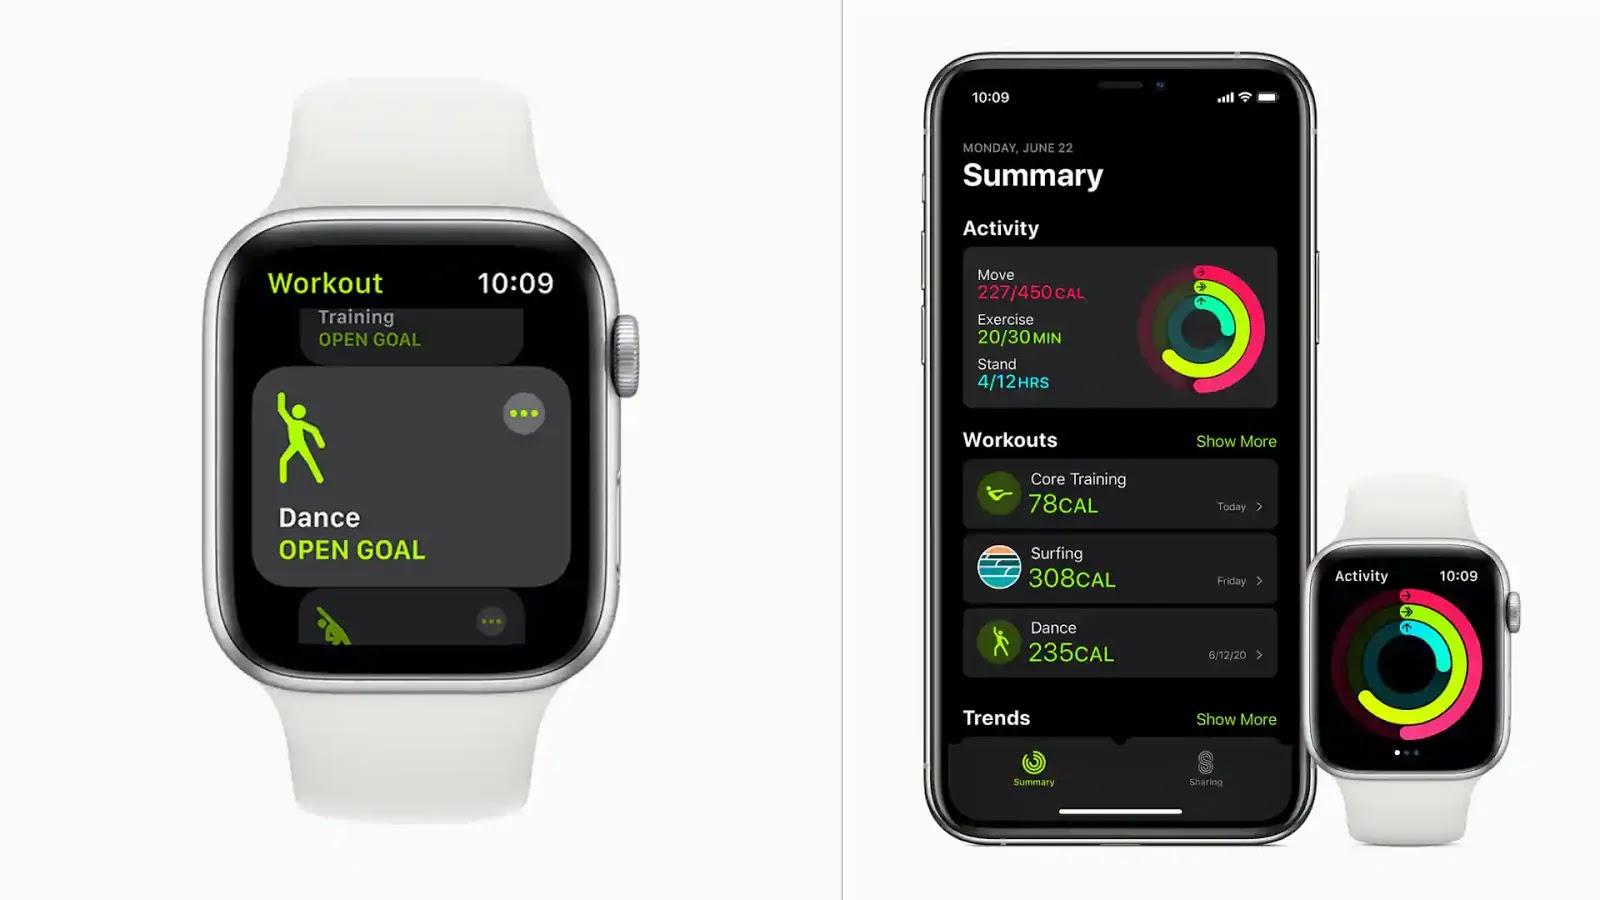 Apple Watch 舞蹈訓練如何正確計算動作和卡路⾥消耗量